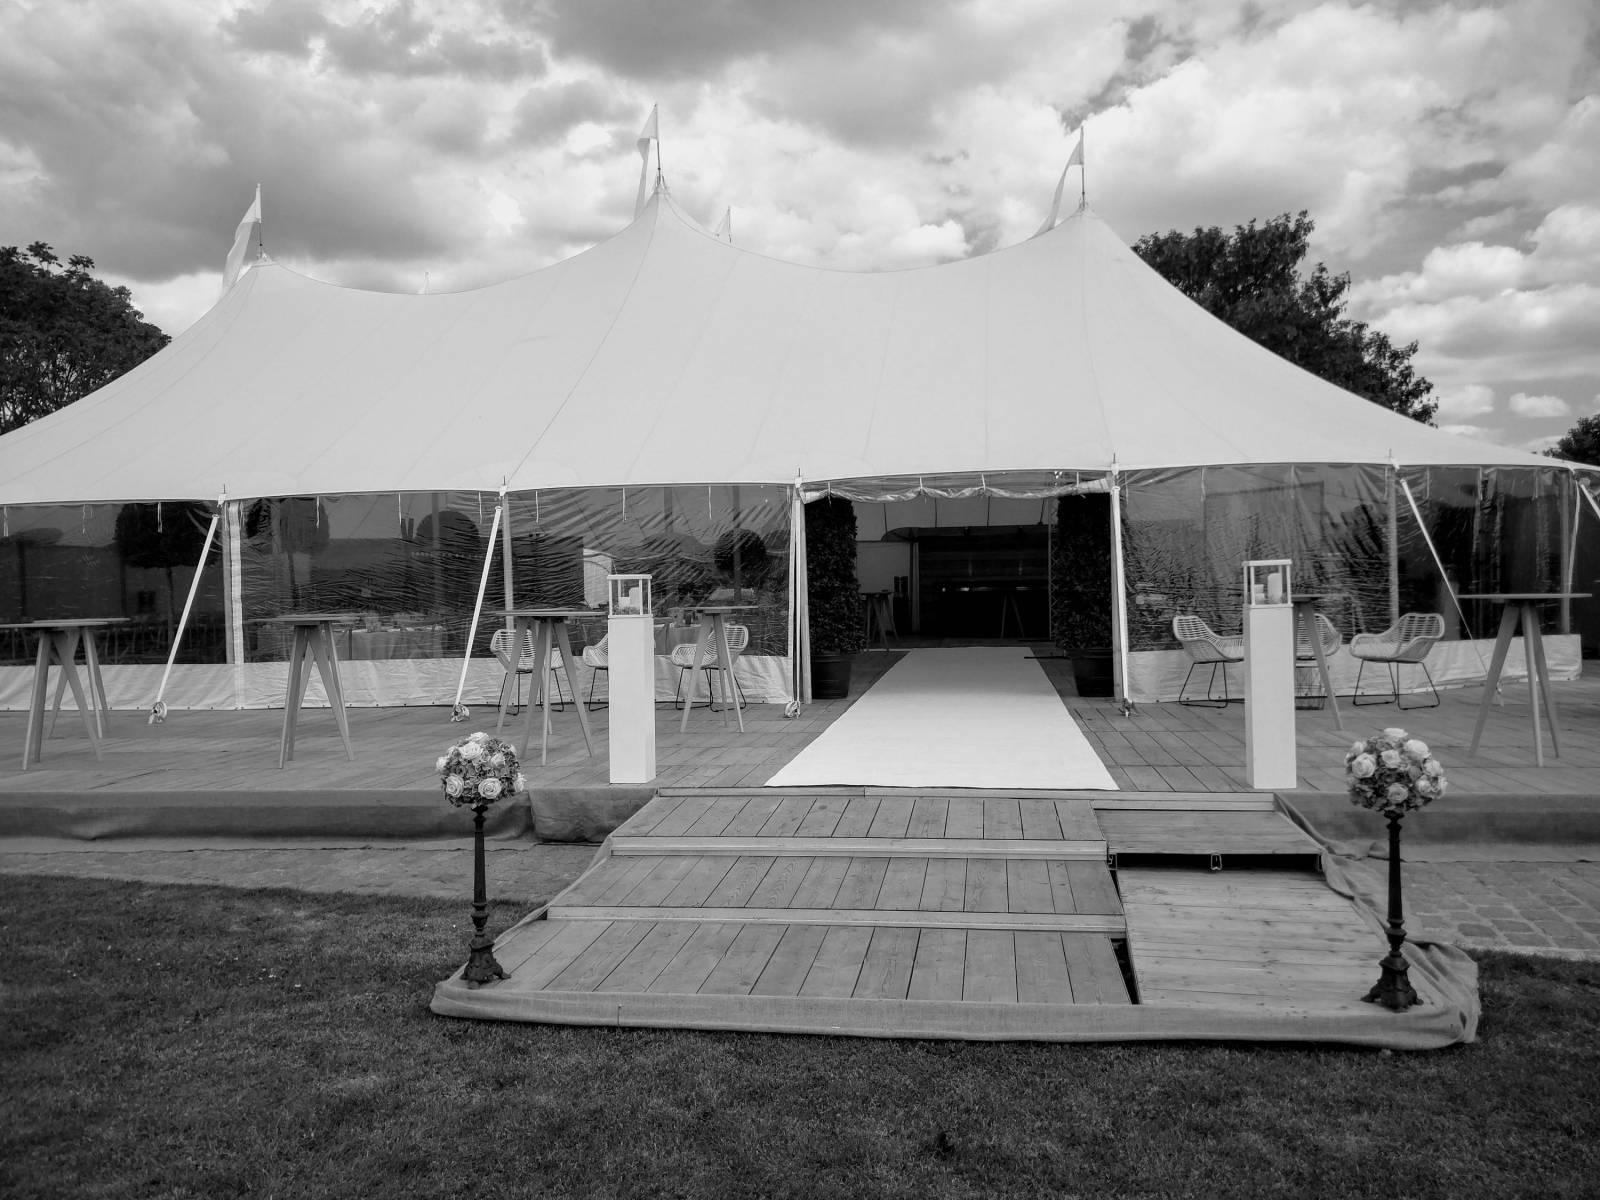 Lamont Ceremonie - Ceremonie - Eigen Foto's - House of Weddings - 3